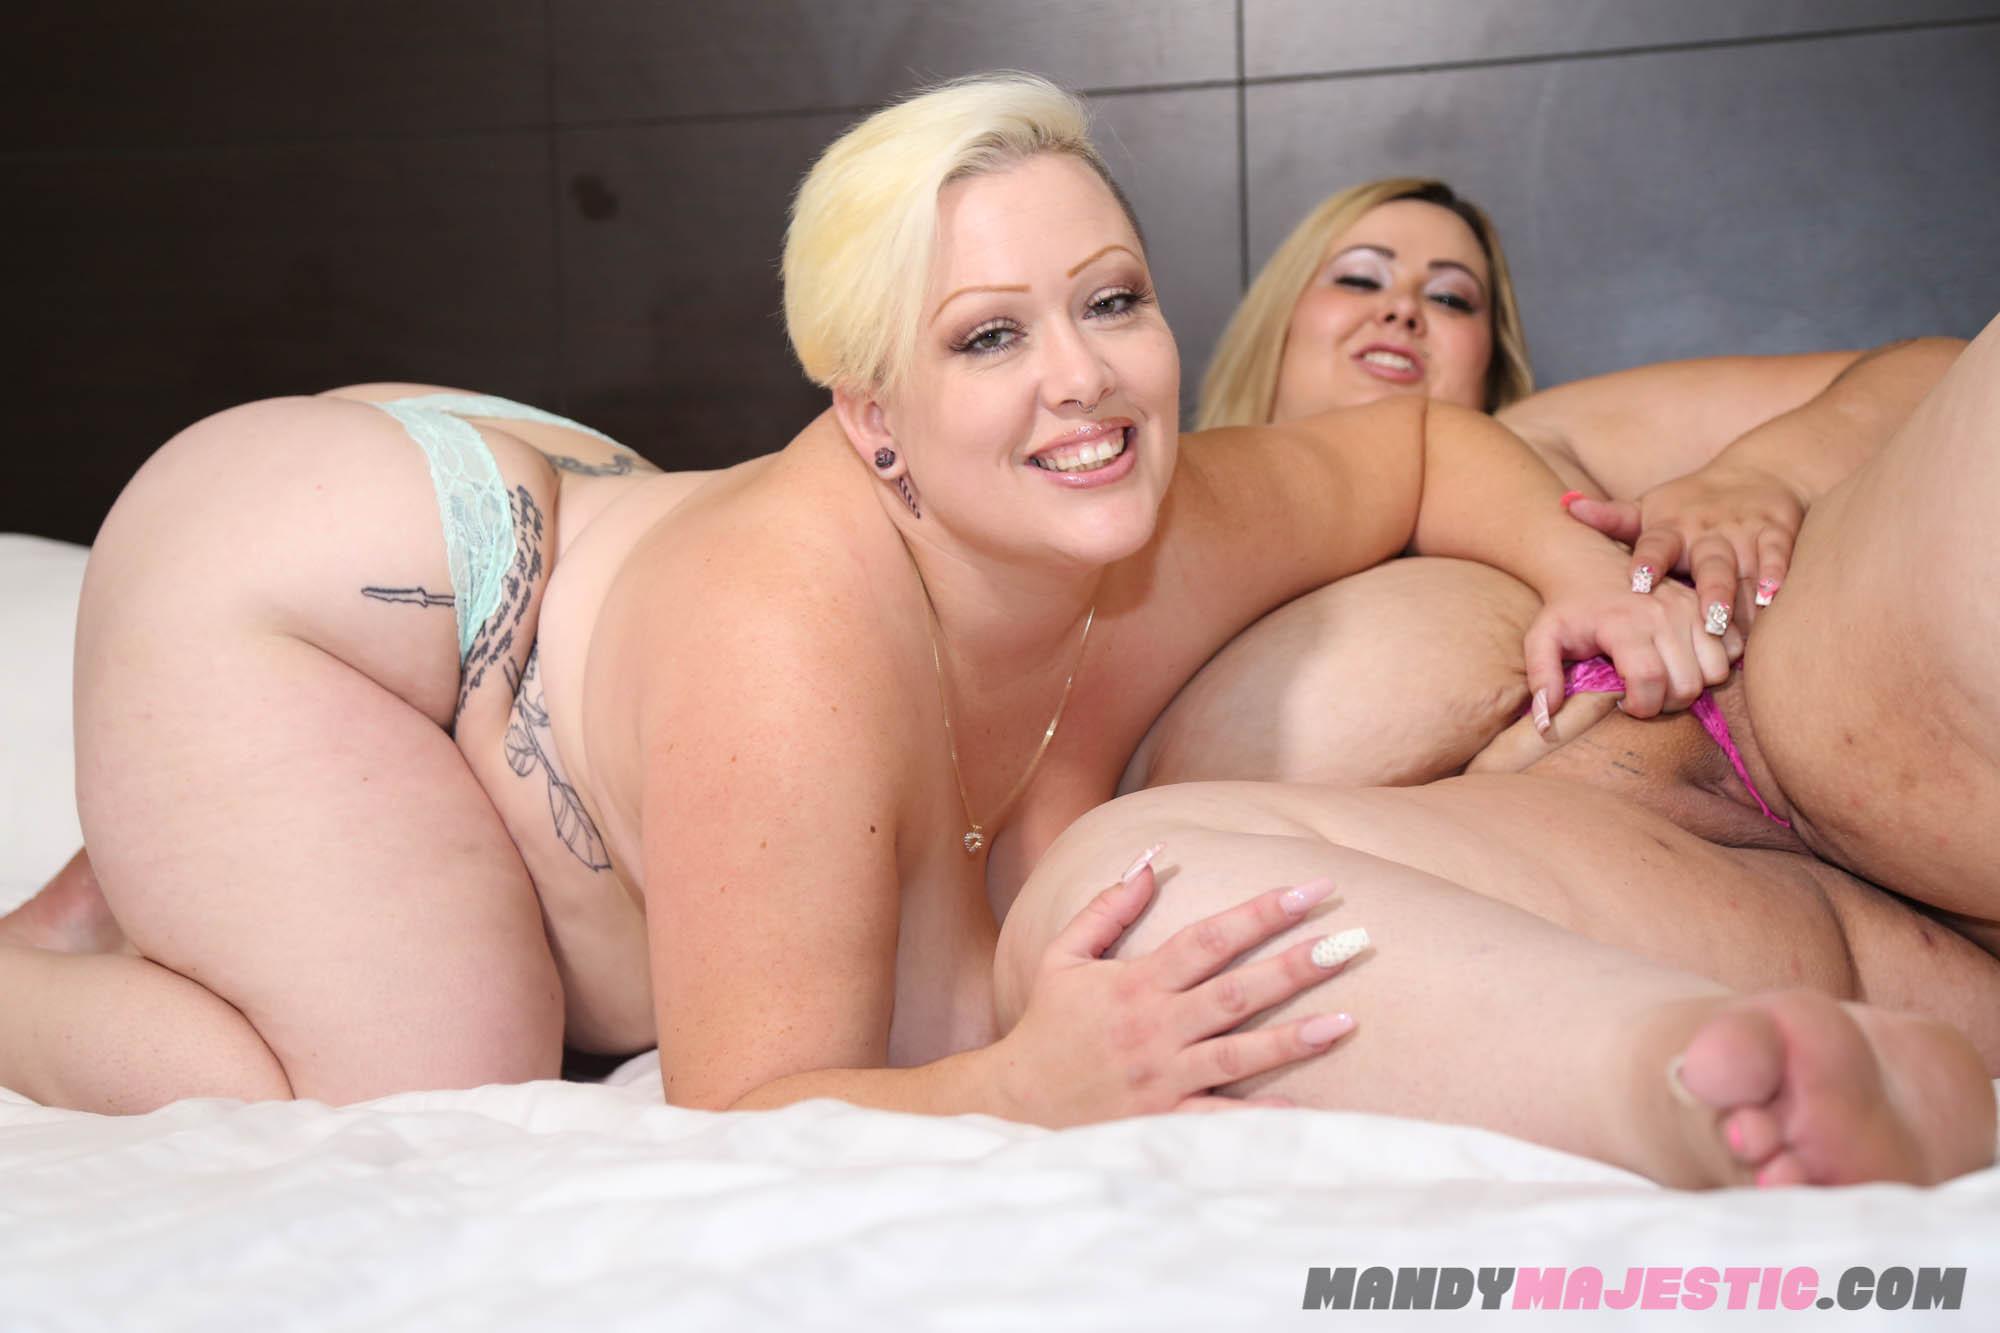 2 Thick Ebony Threesome